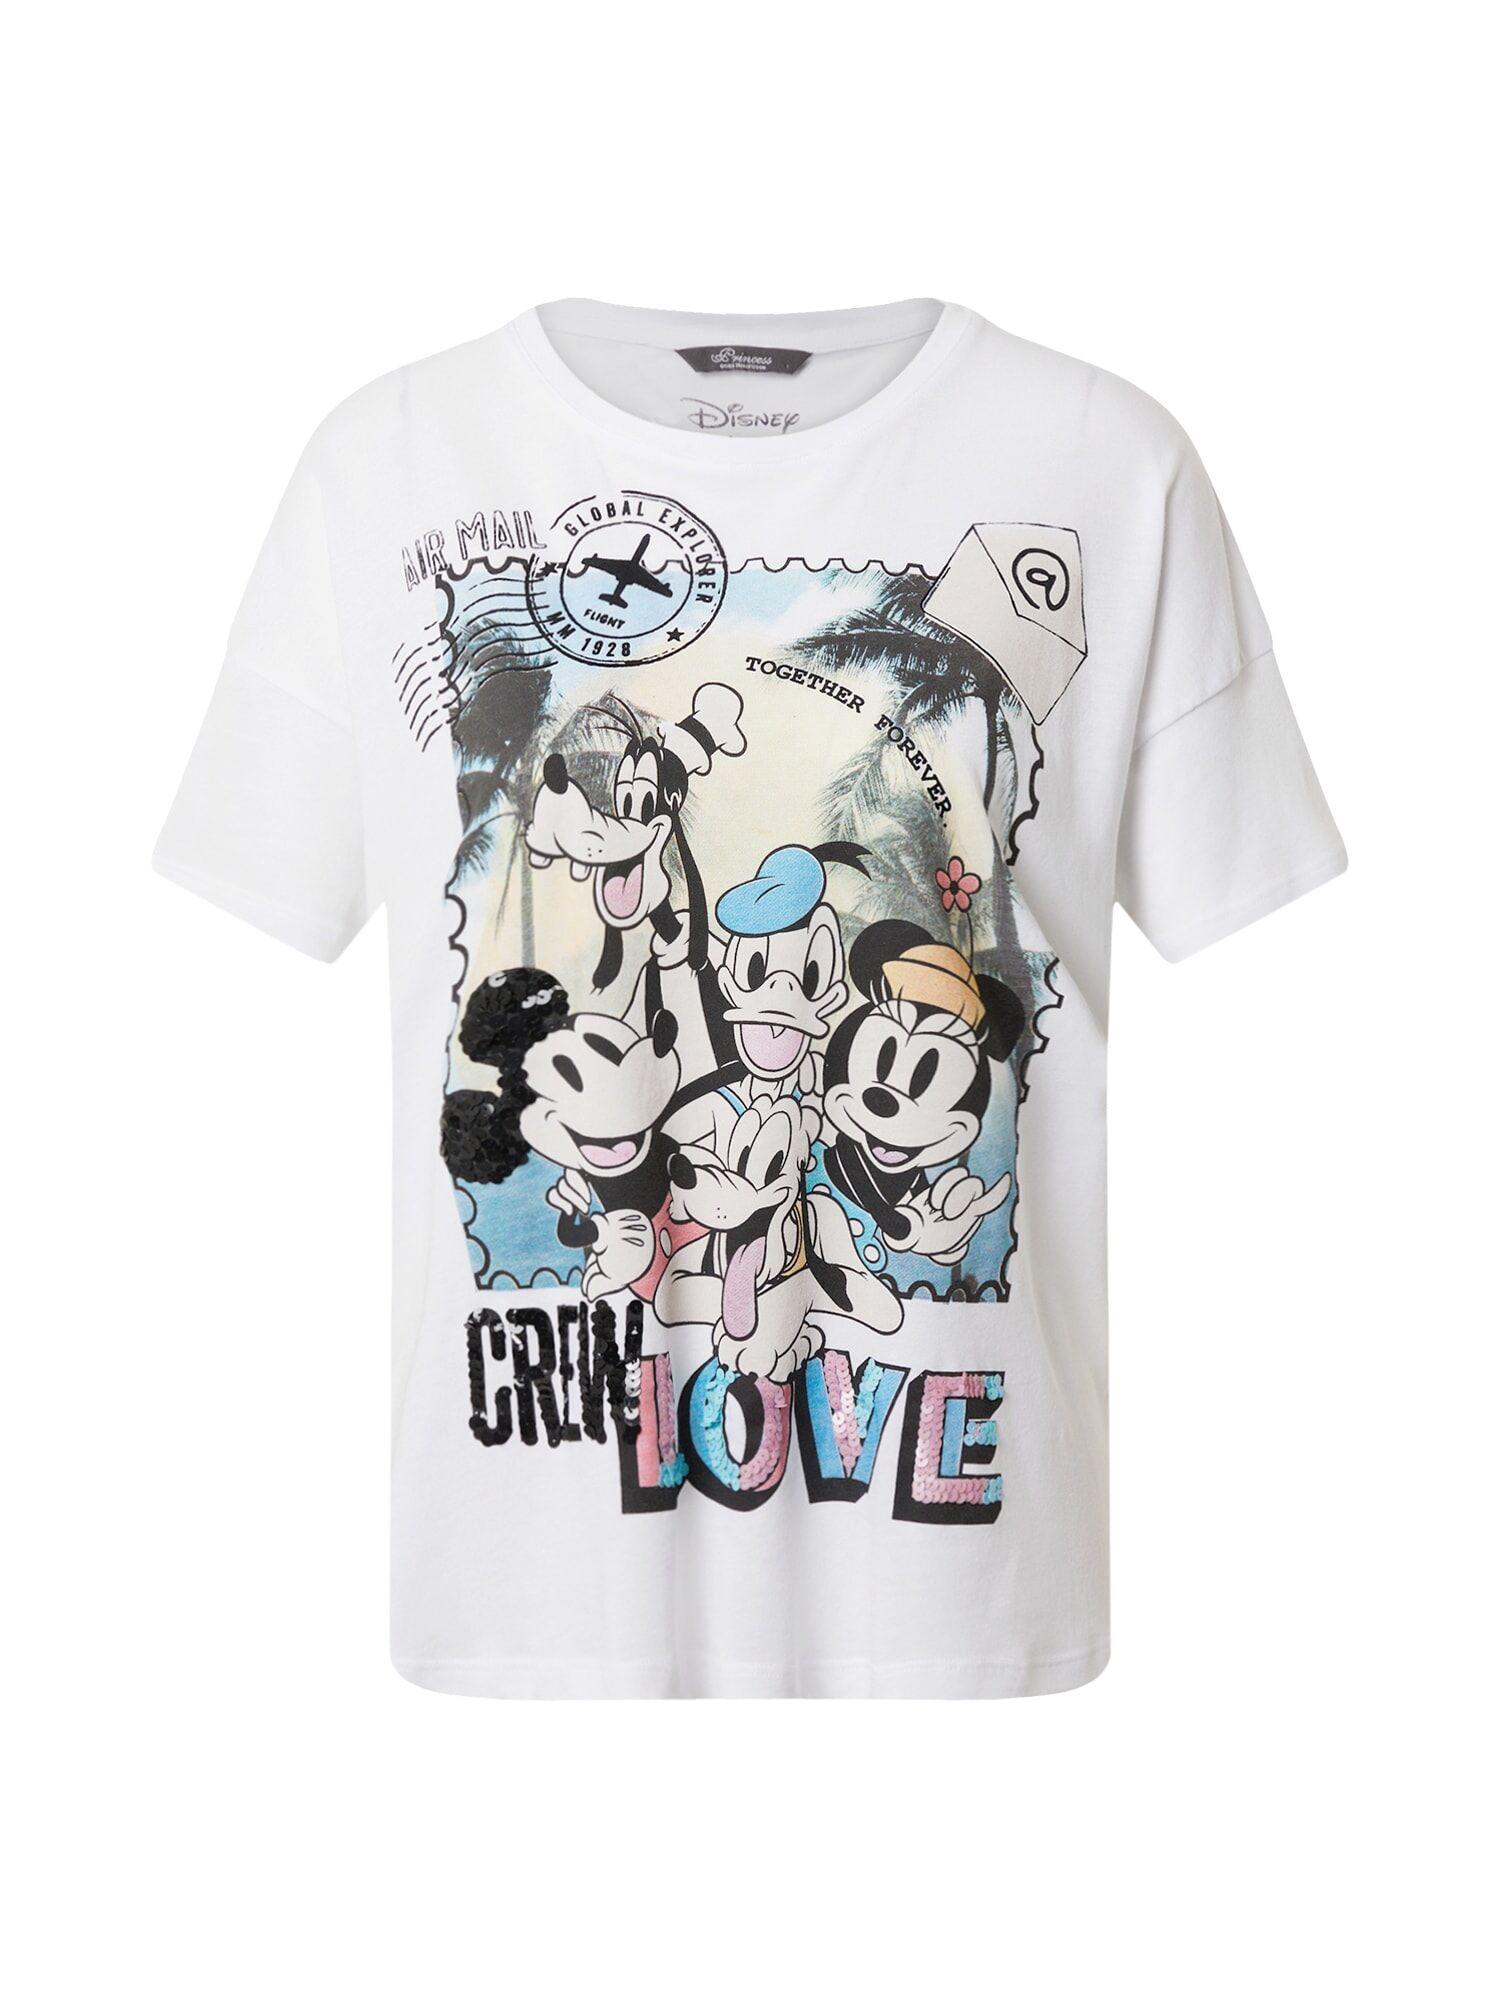 Princess T-shirt 'Disney Crew Love'  - Blanc - Taille: 44 - female